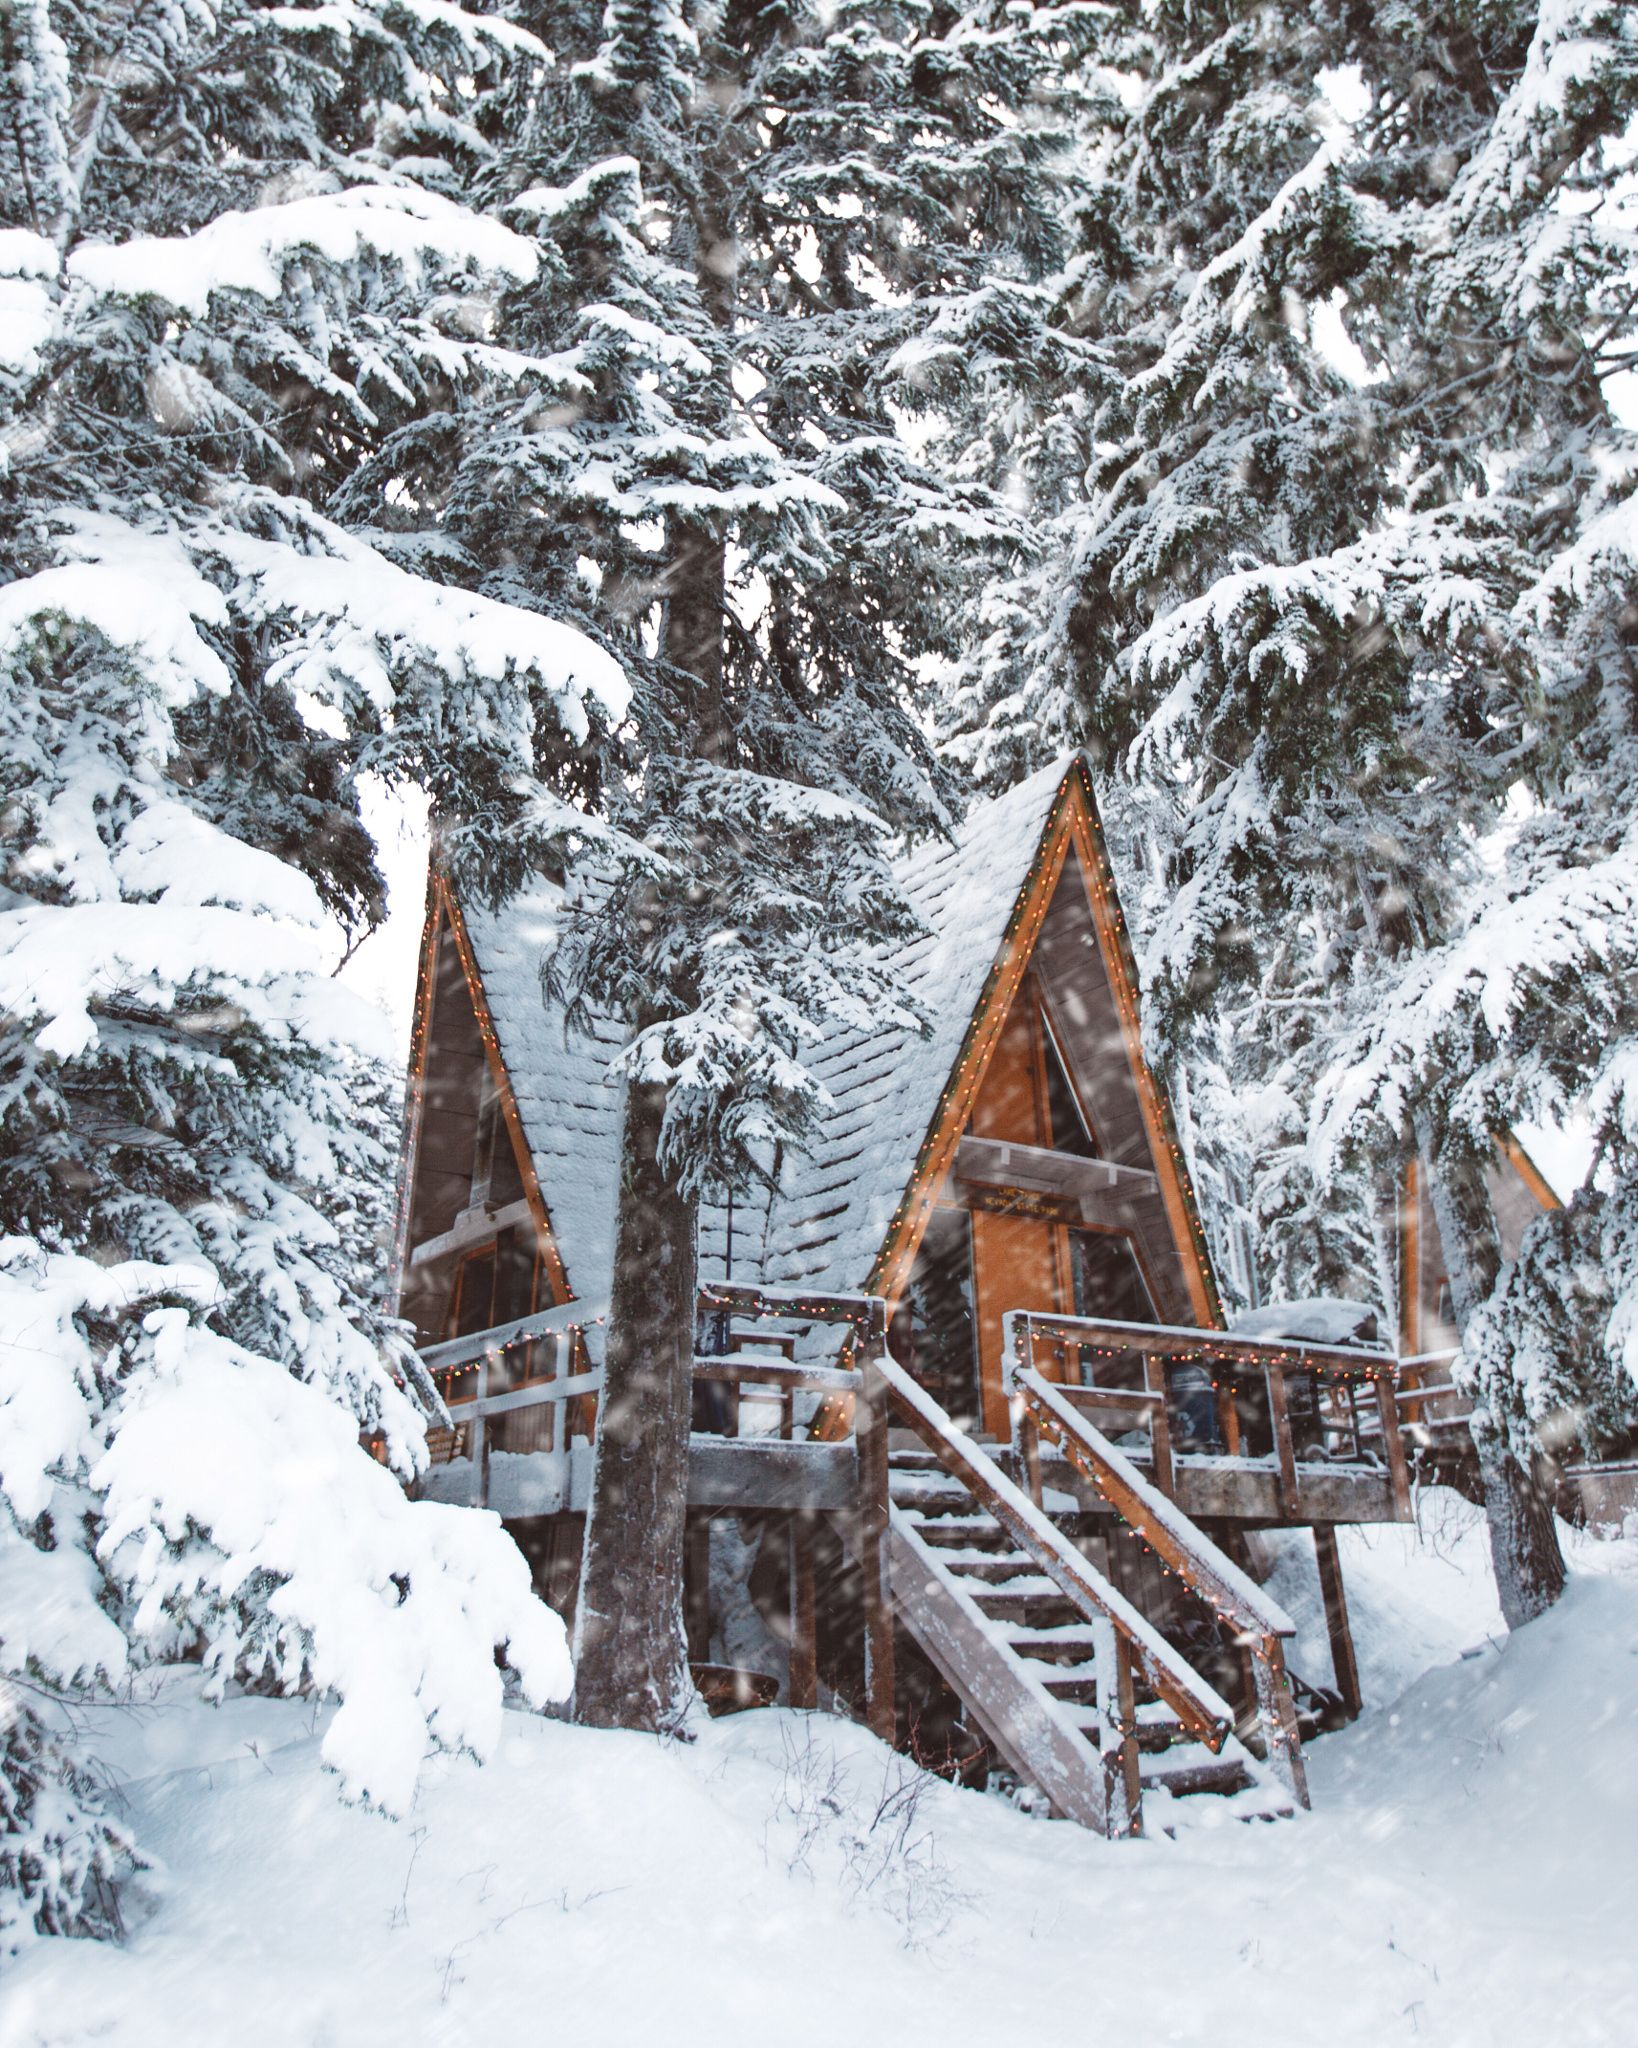 Winter escape usa by kyle kuiper on 500px winter wonderland pinterest invierno caba as y - Cabana invierno ...